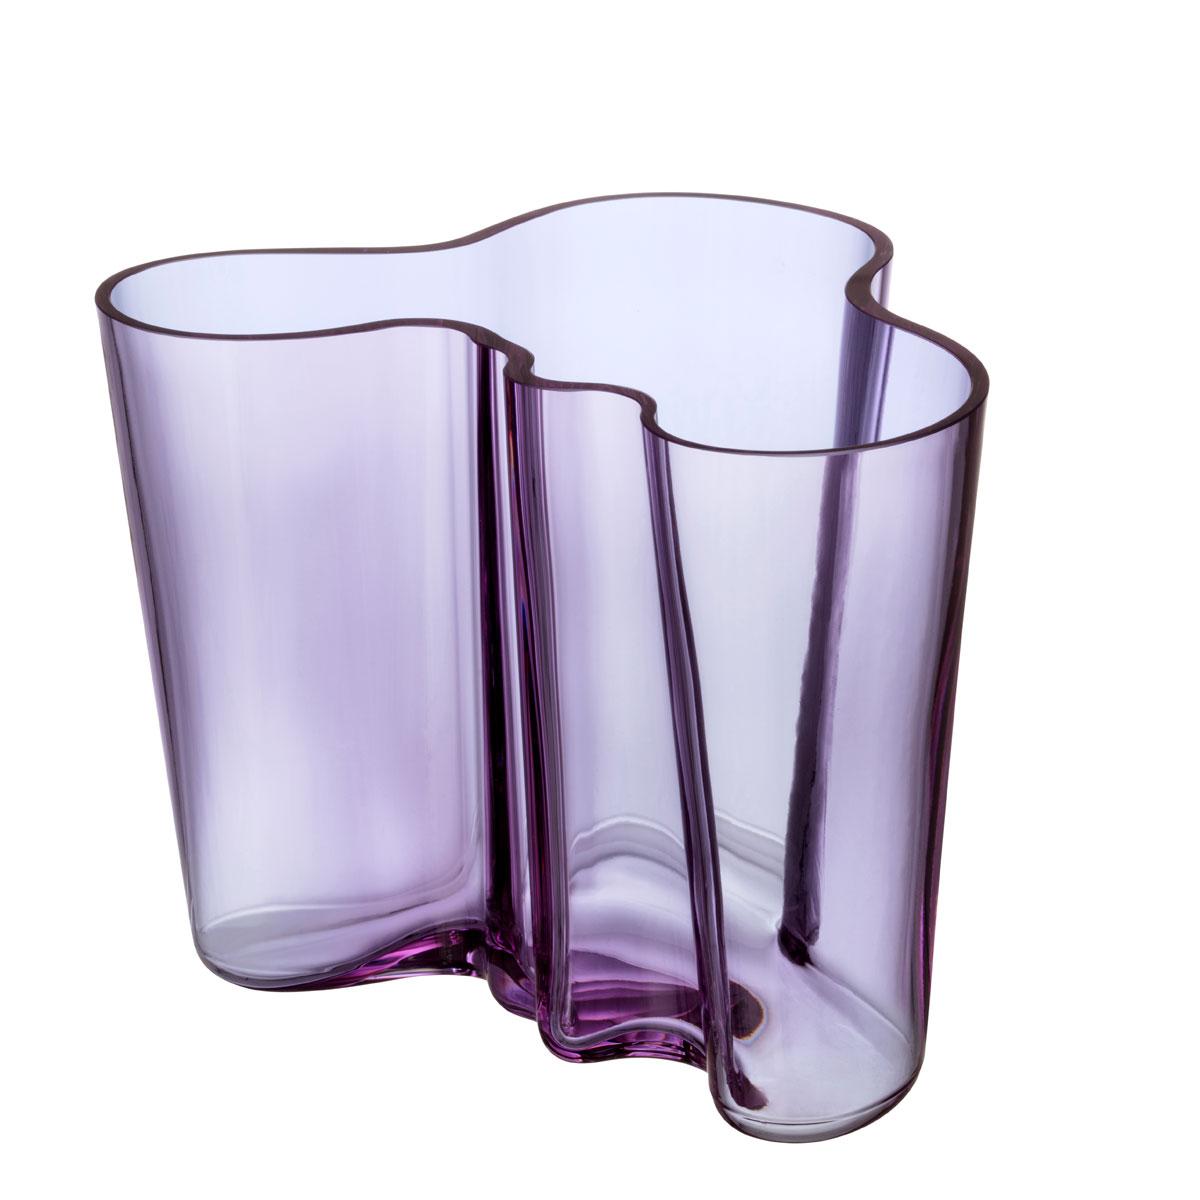 "Iittala Aalto Vase 6.25"" Amethyst"